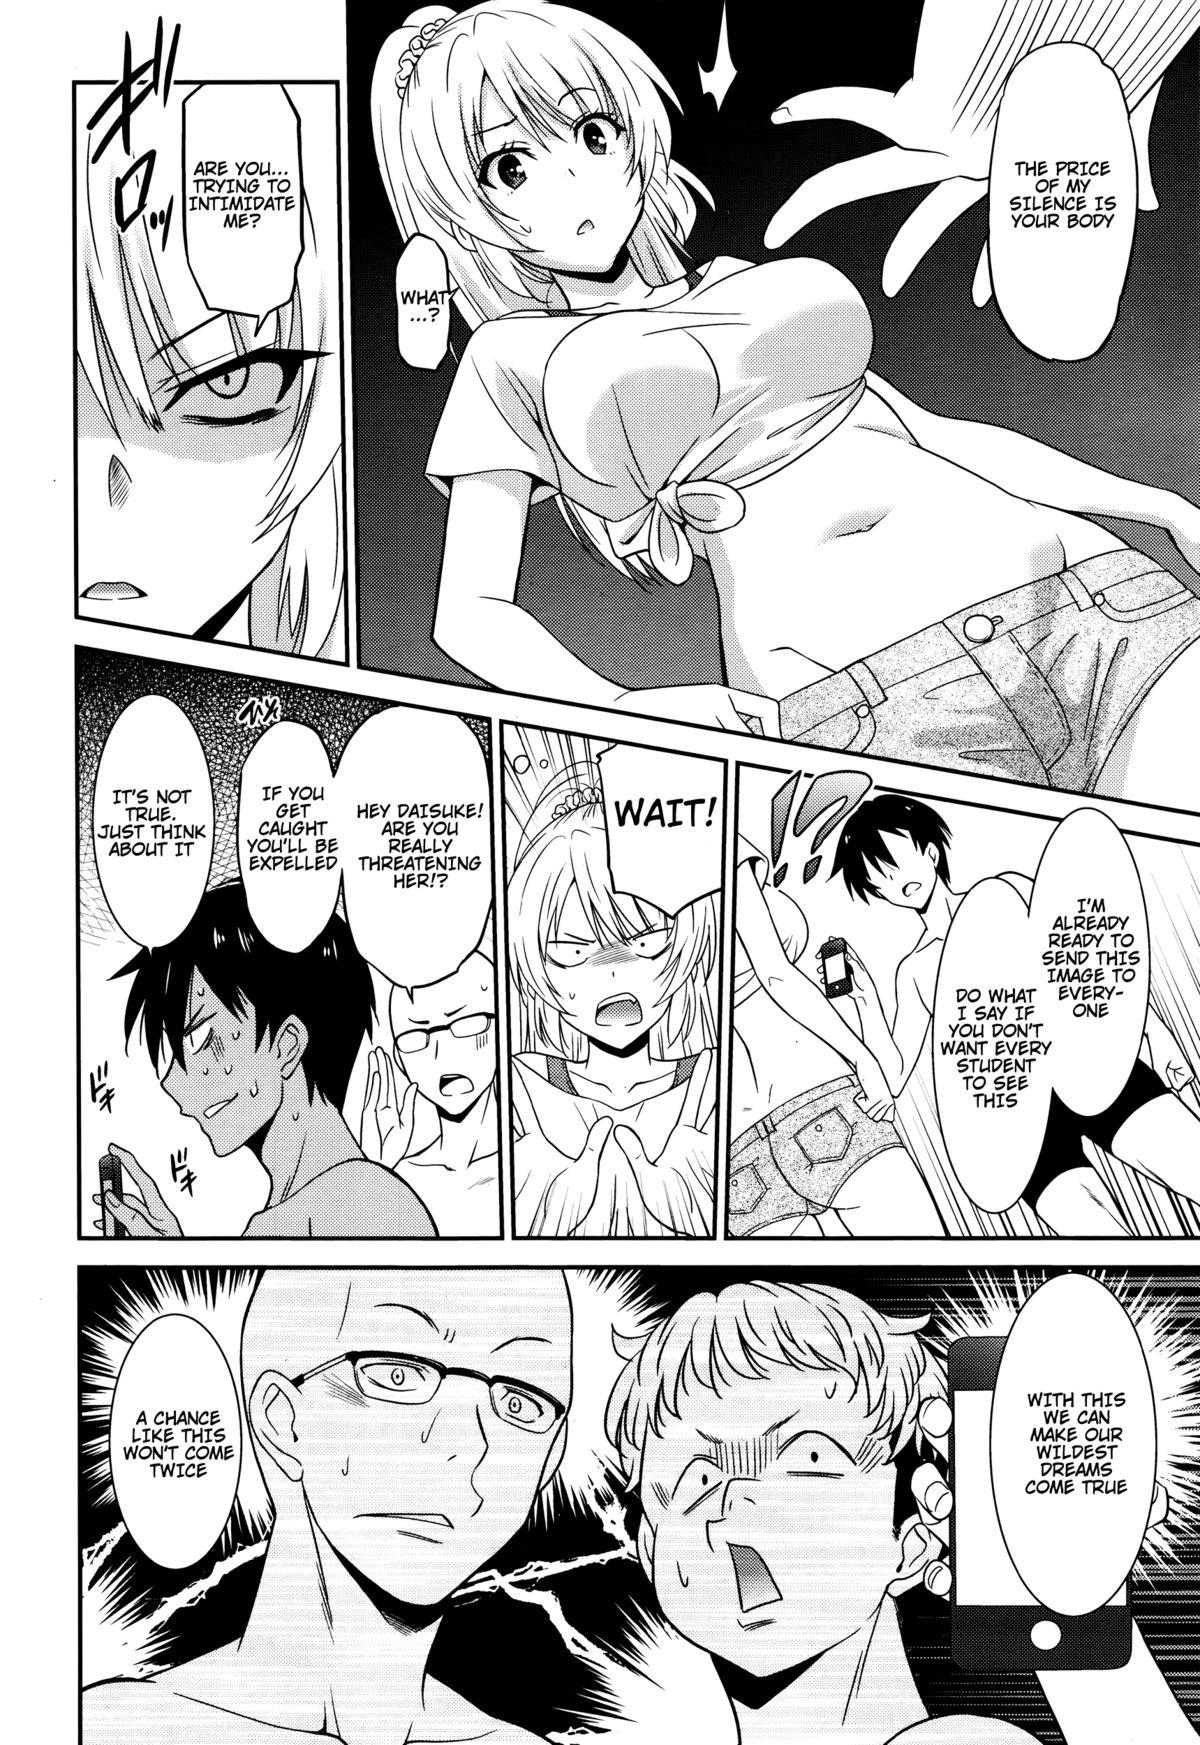 [Otono Natsu] Hataraku Onnanoko -Onnakyoushi Hen 1- | Working Girl -Female Teacher Chapter- (Manga Bangaichi 2016-01) [English] [Na-Mi-Da] 5